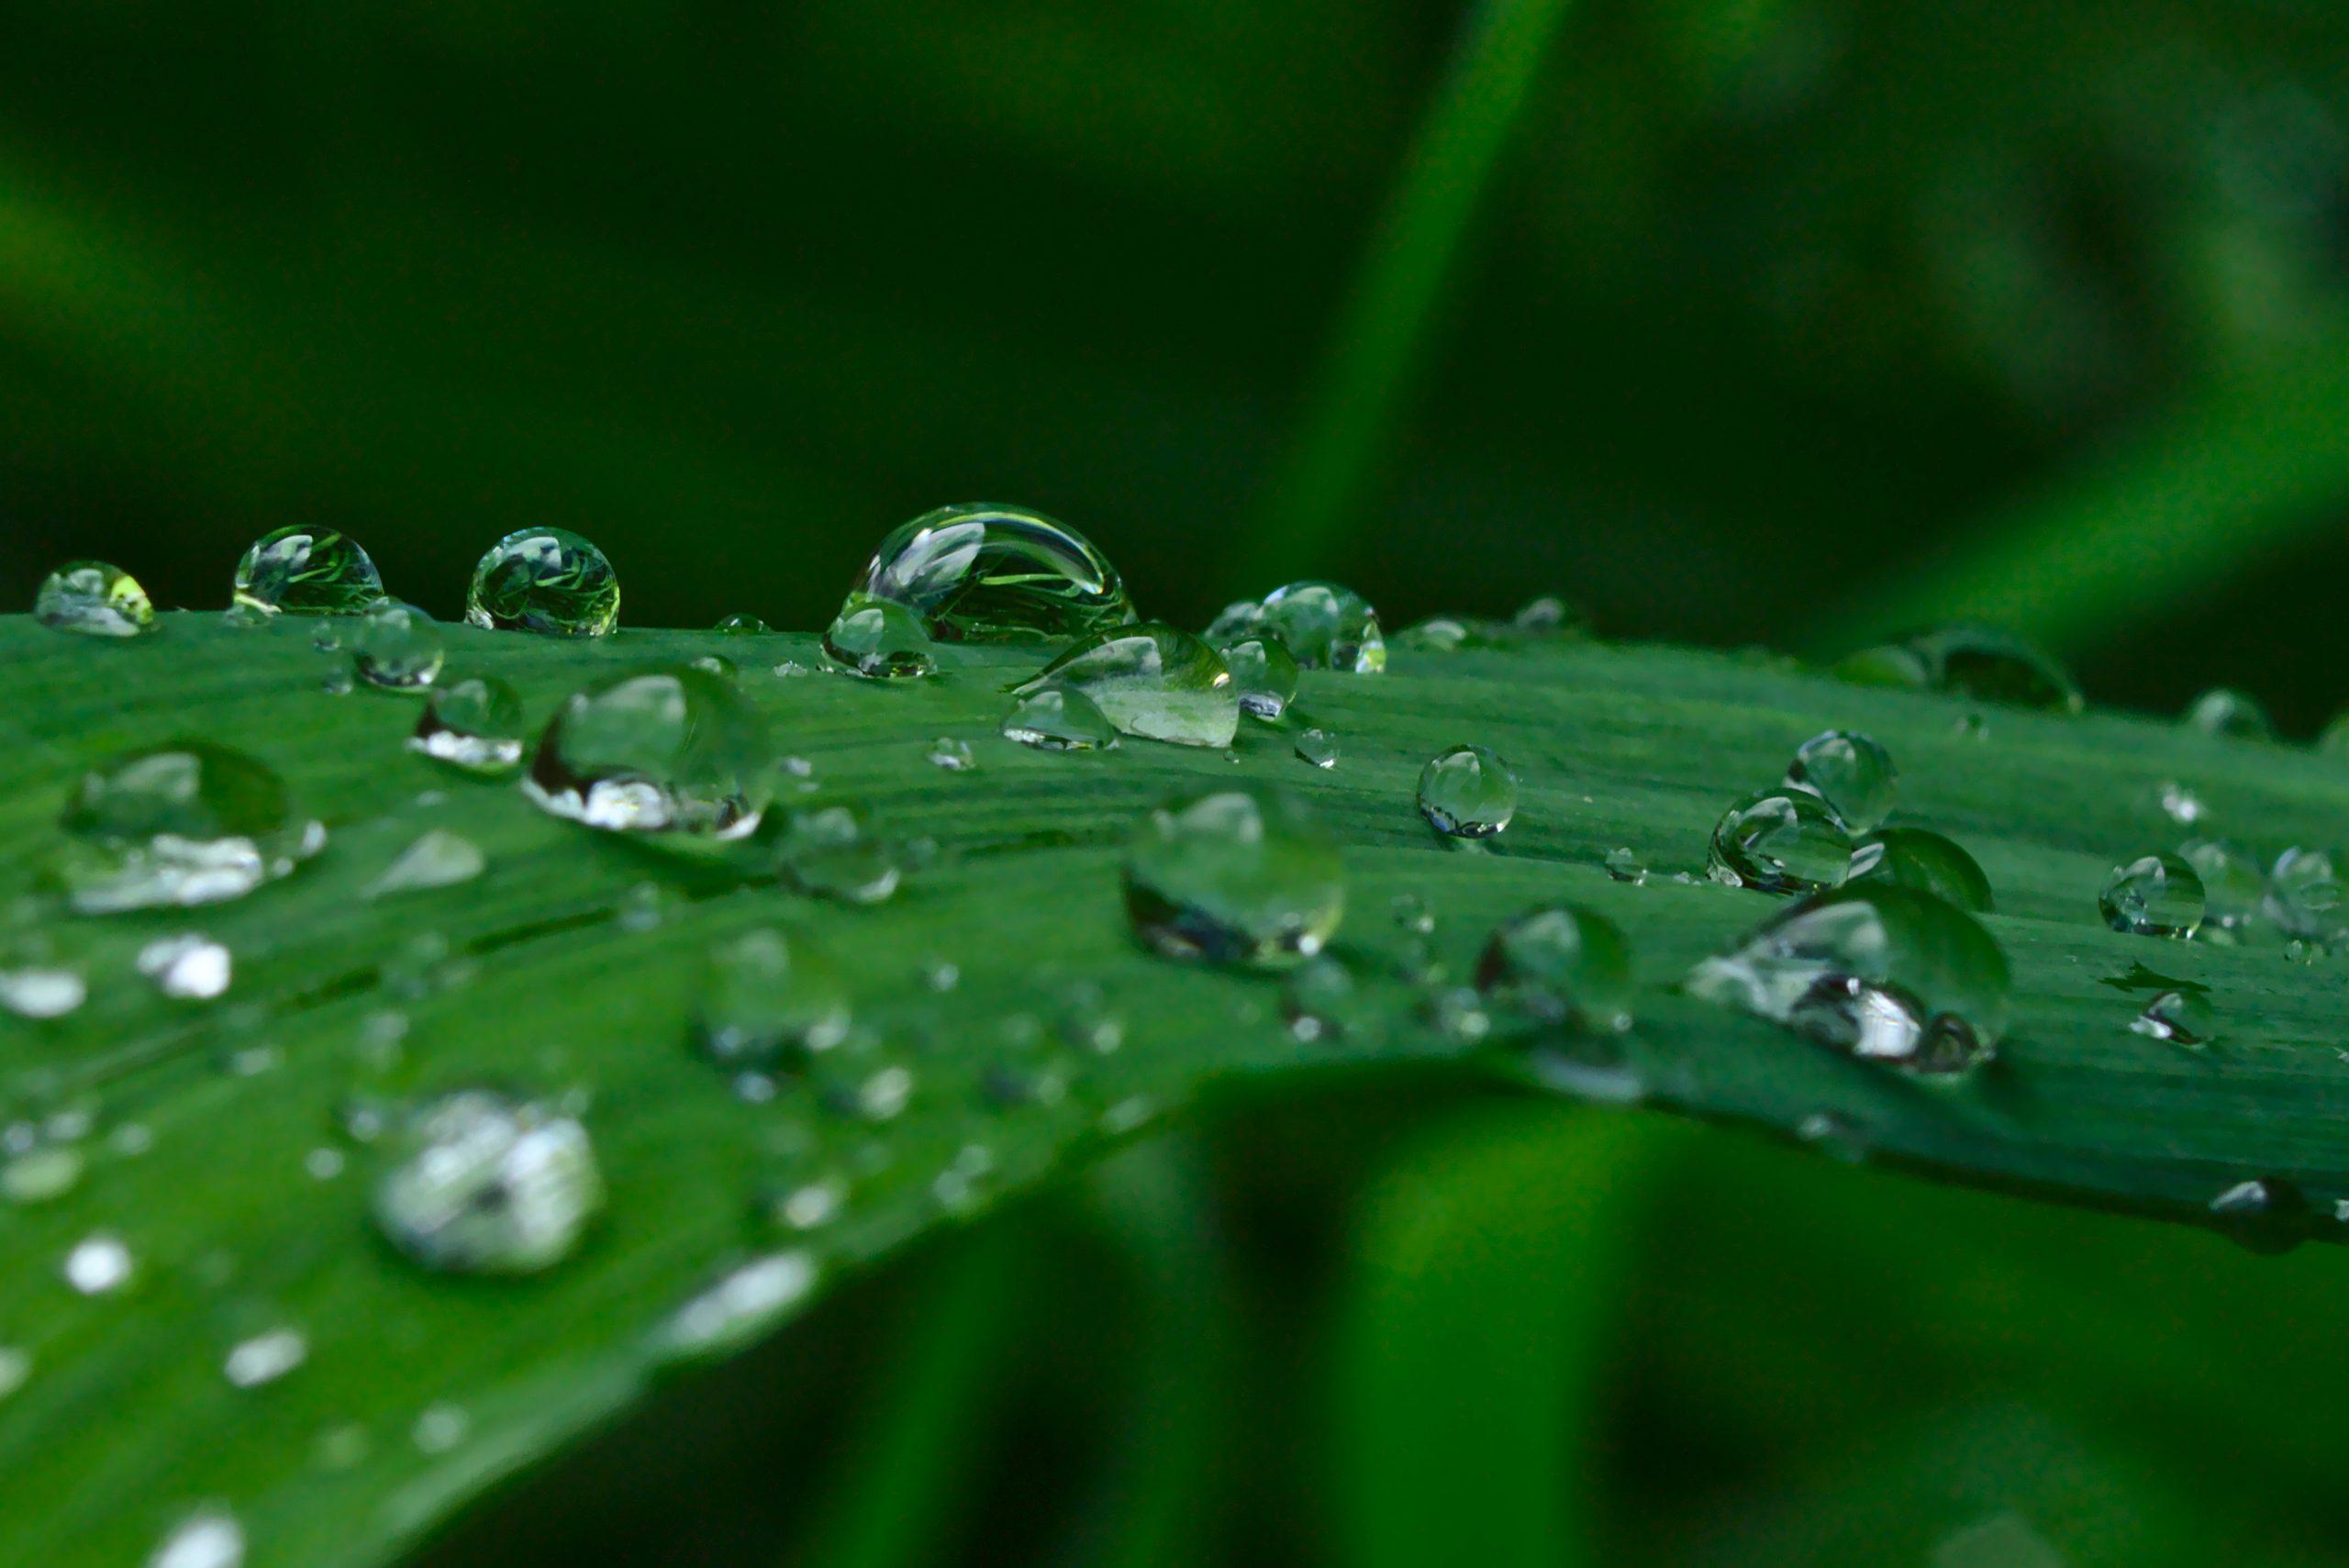 Raindrops on daylily leaf